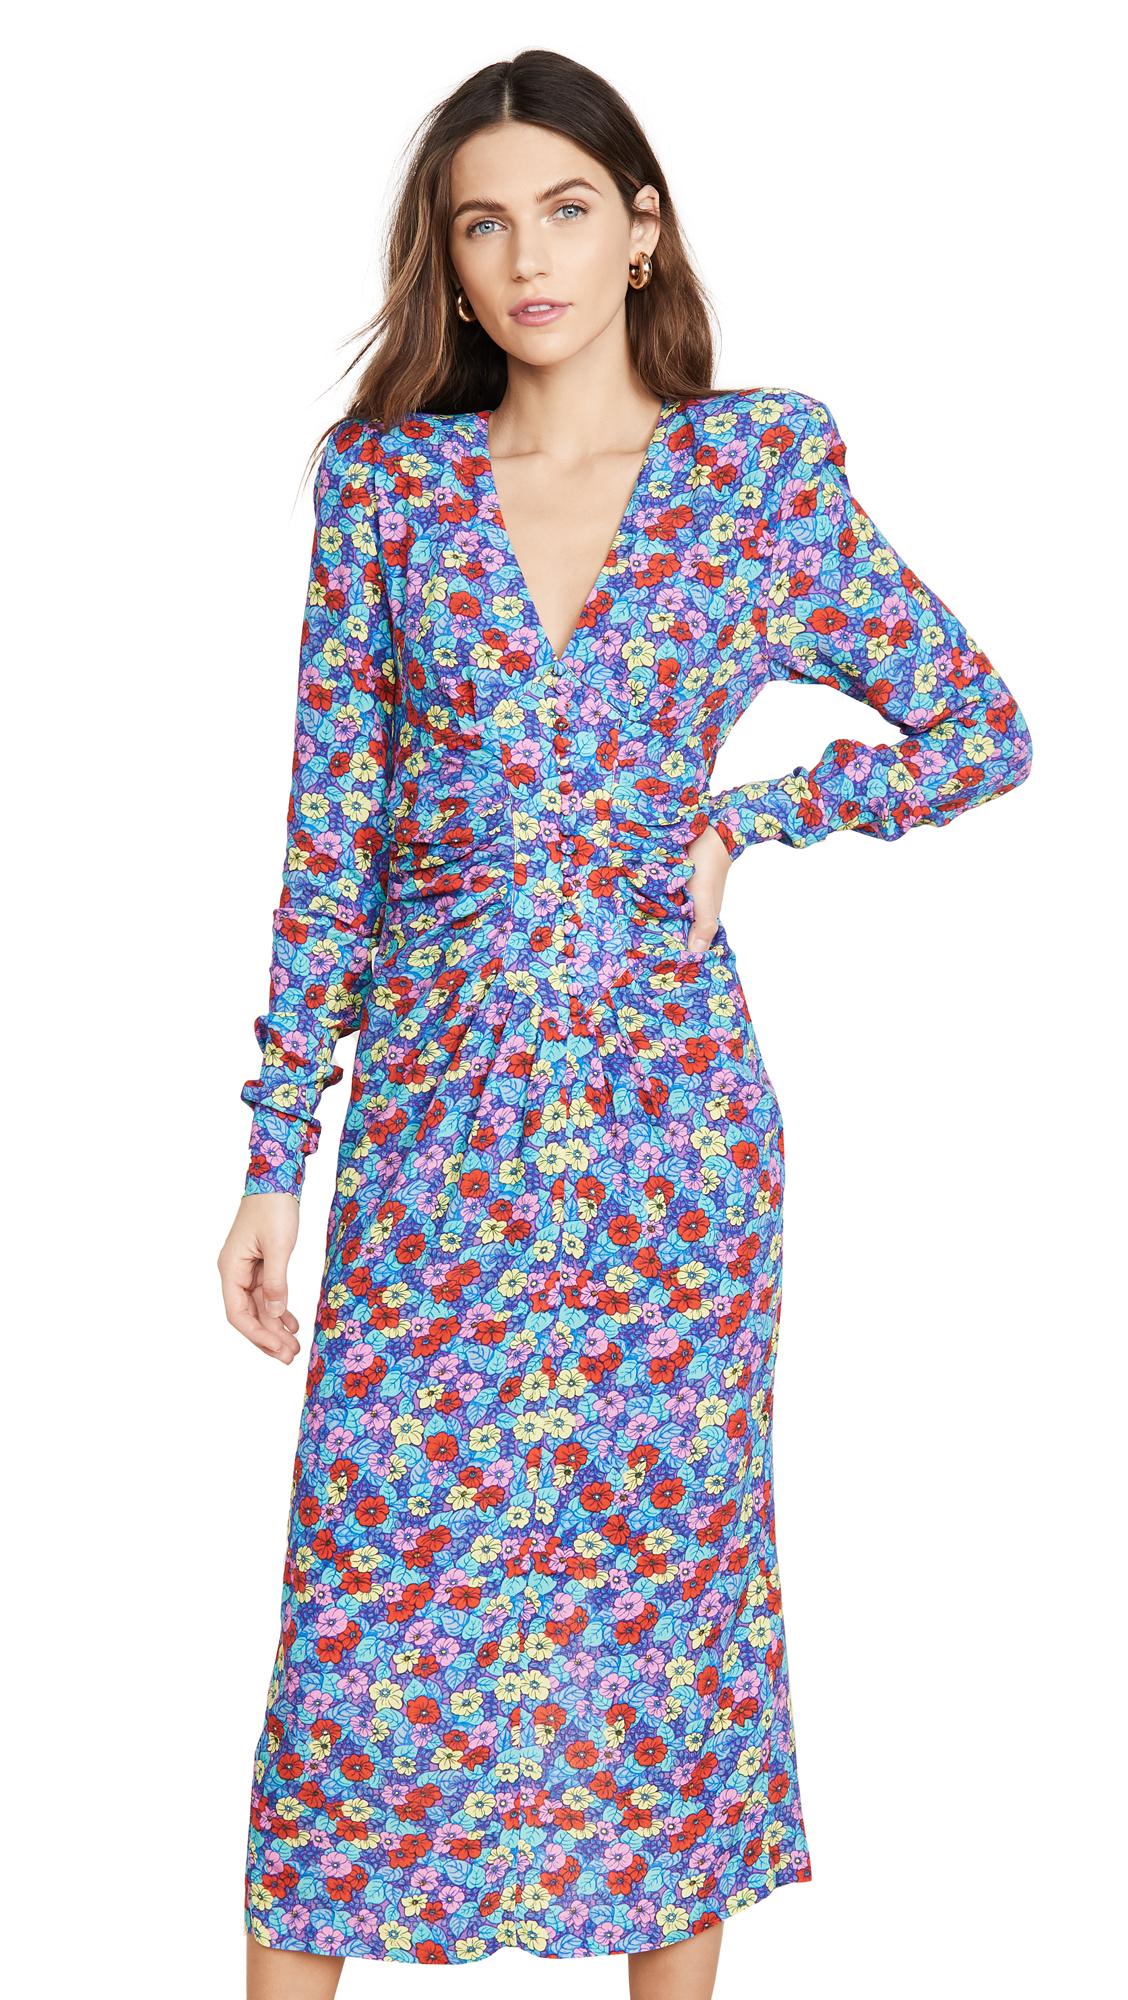 ROTATE Heather Dress - 30% Off Sale